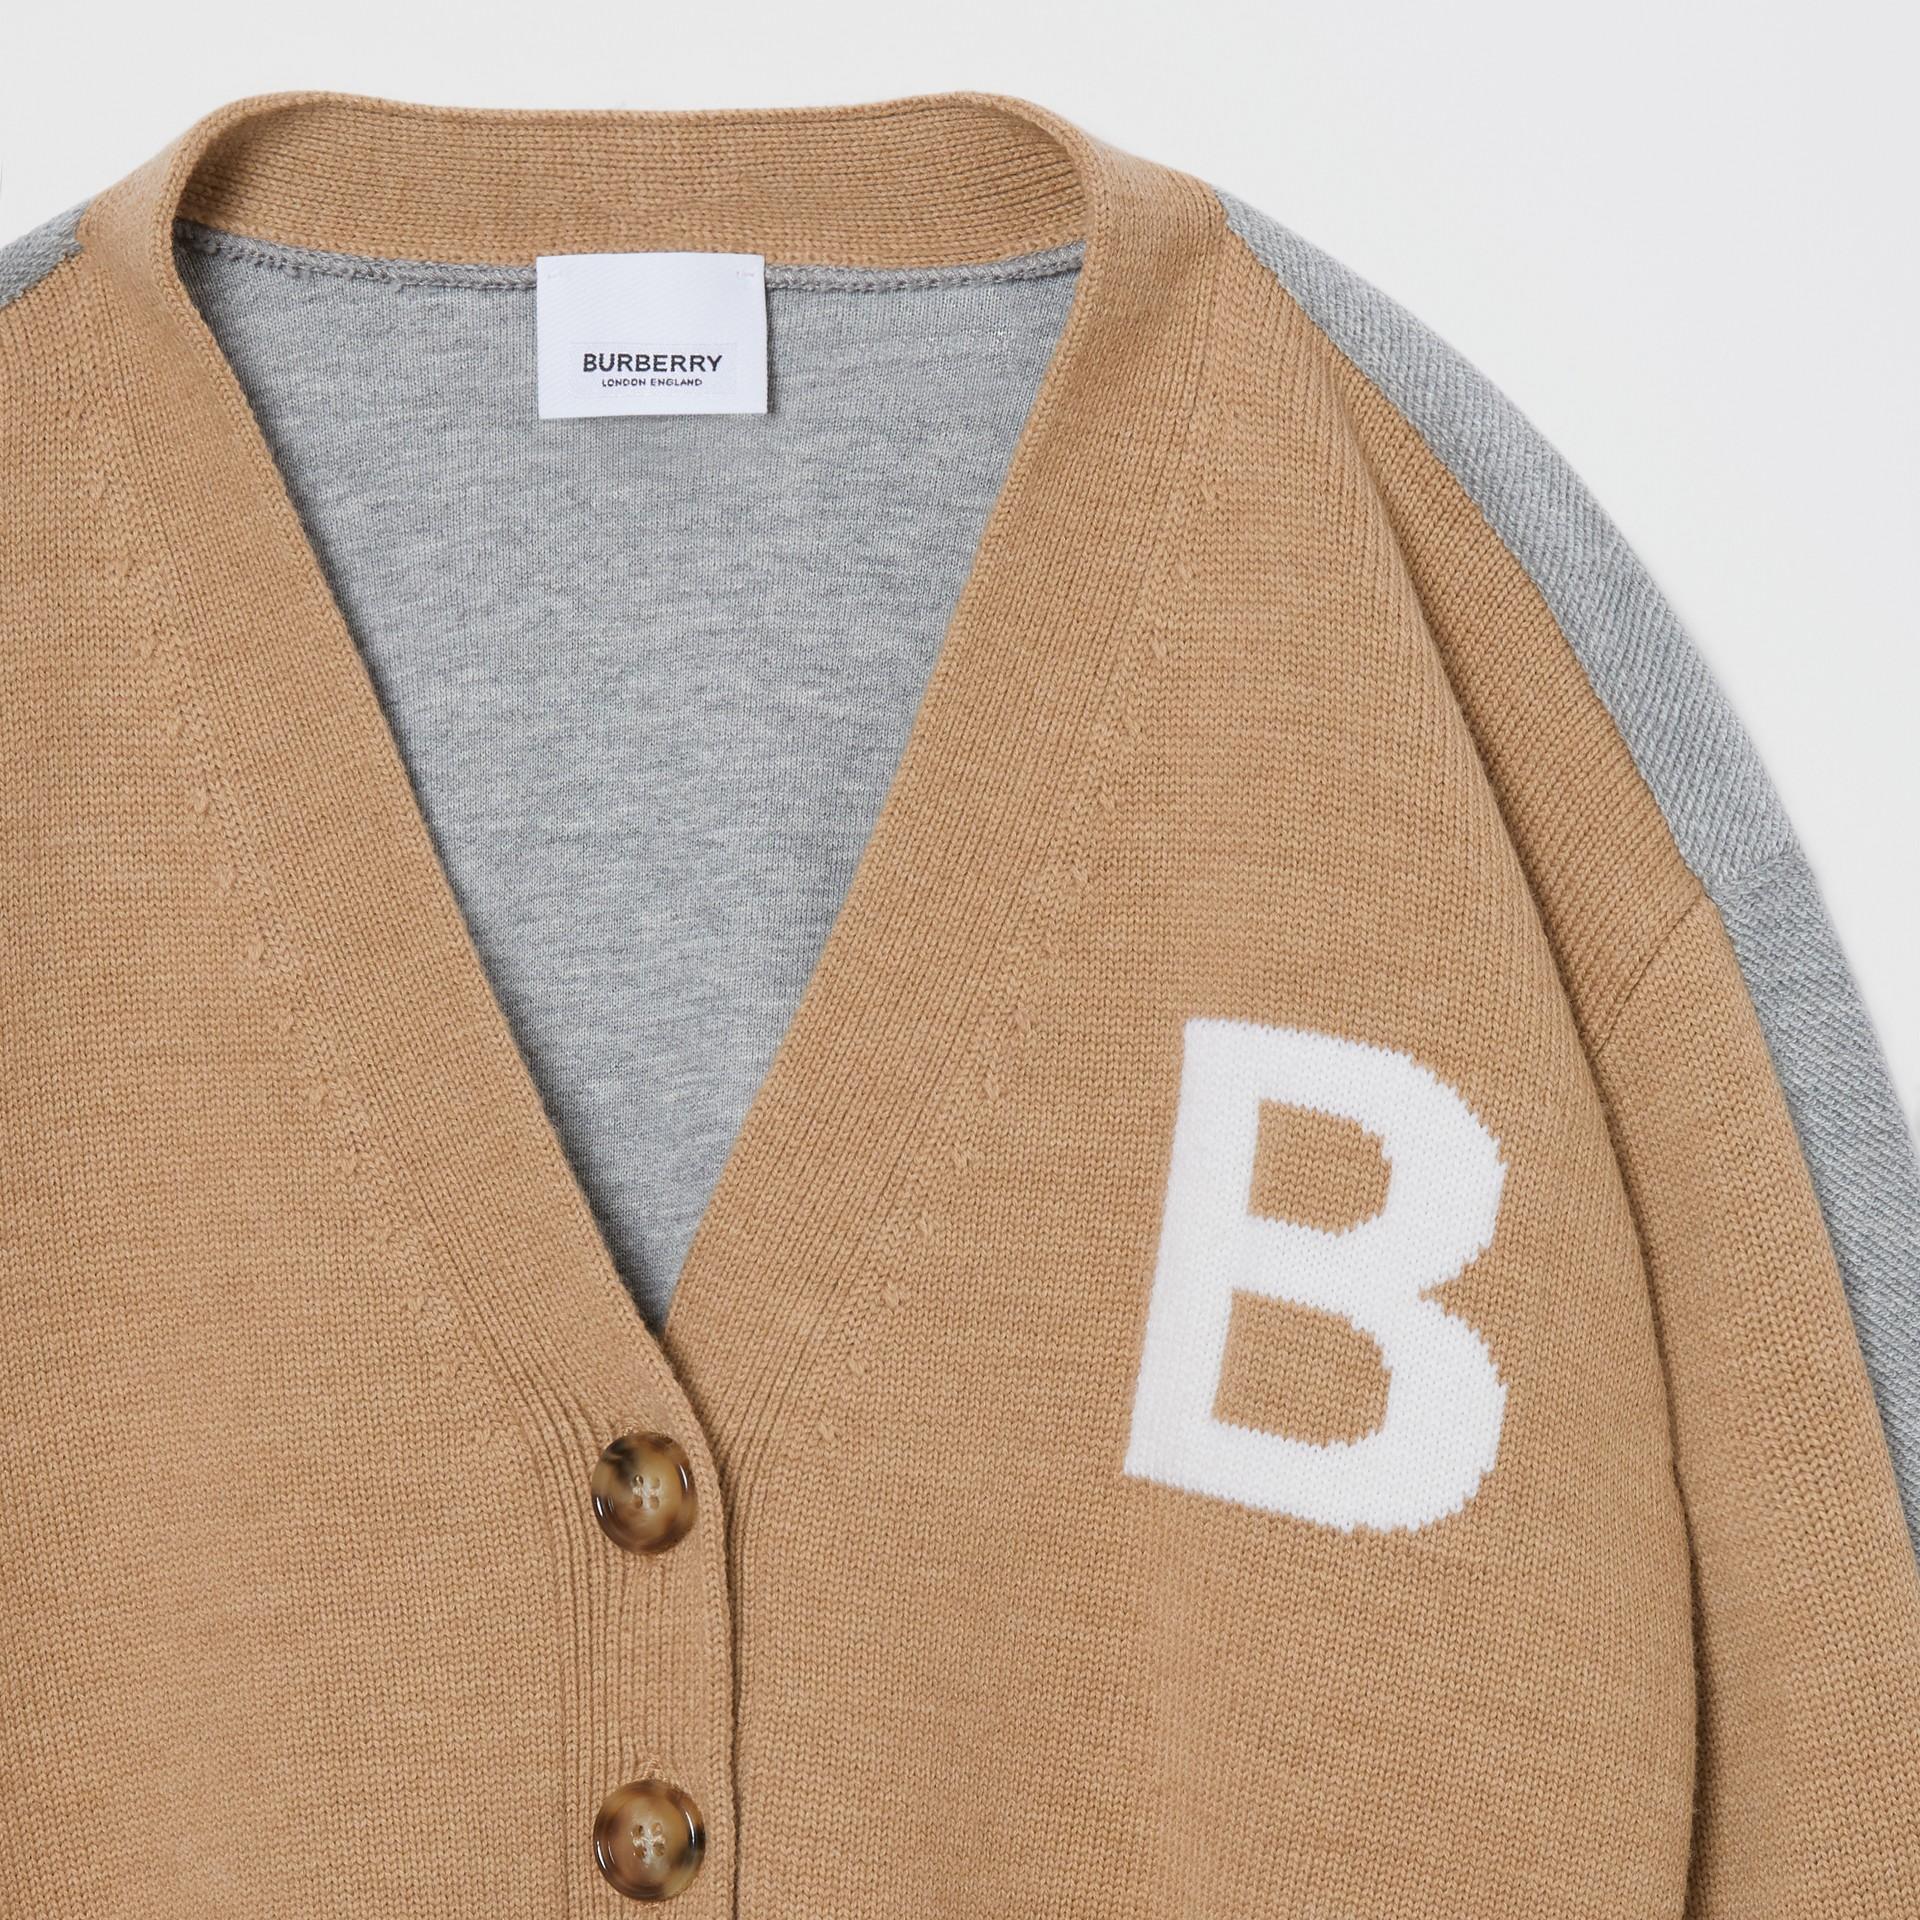 B Motif Merino Wool Jacquard Cardigan in Camel | Burberry - gallery image 1